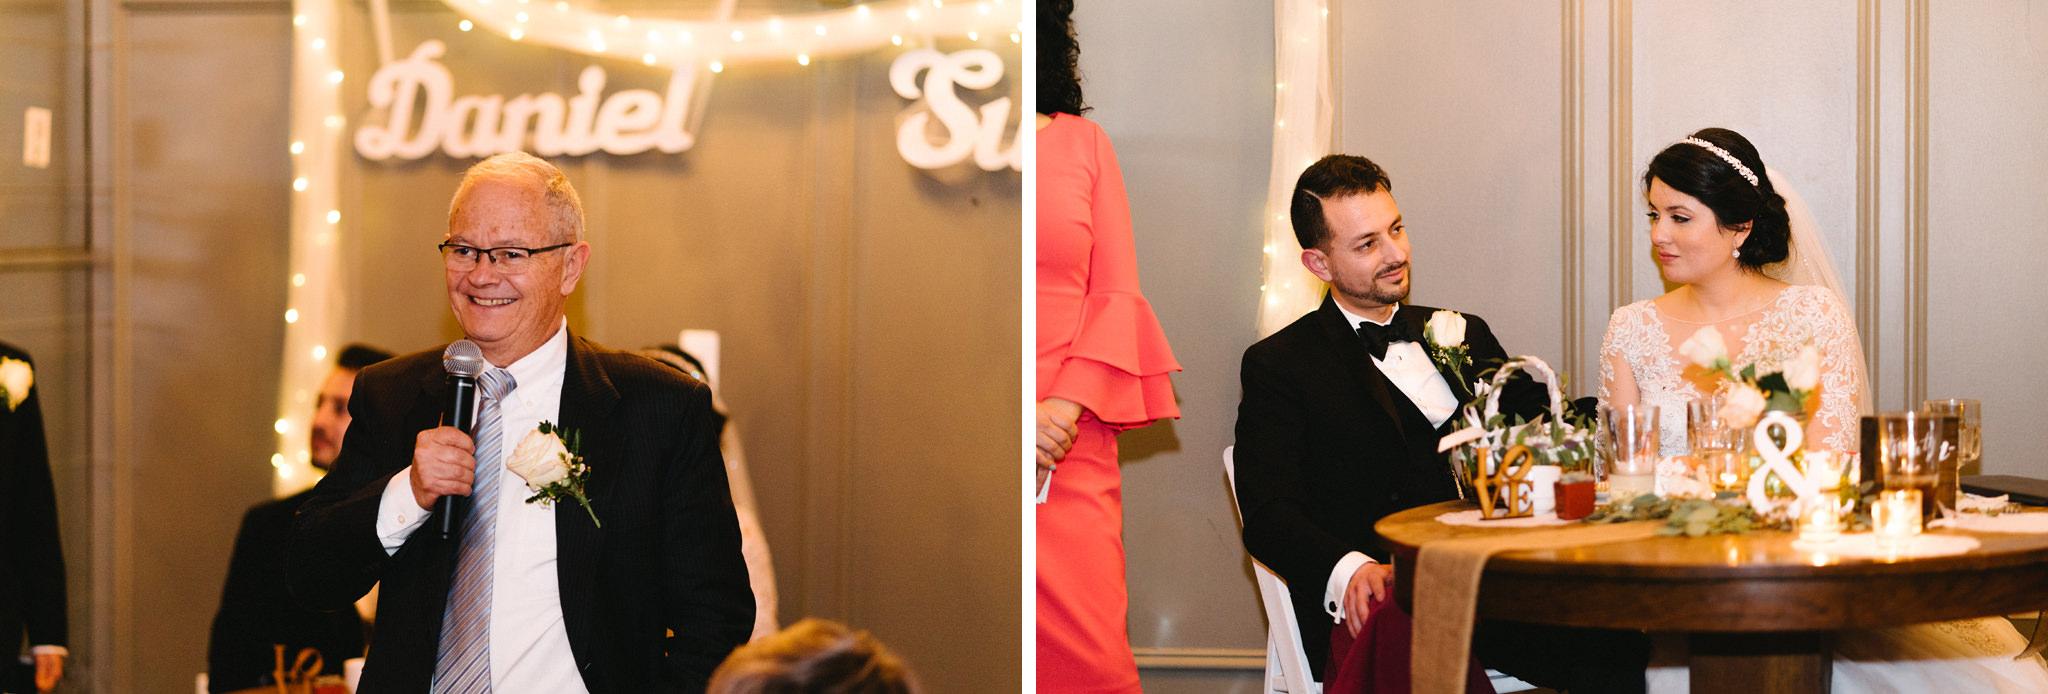 052-rempel-photography-chicago-wedding-inspiration-susan-daniel-michigan-metro-detroit-christian-church-holly-vault-cupcakes-and-kisses.jpg